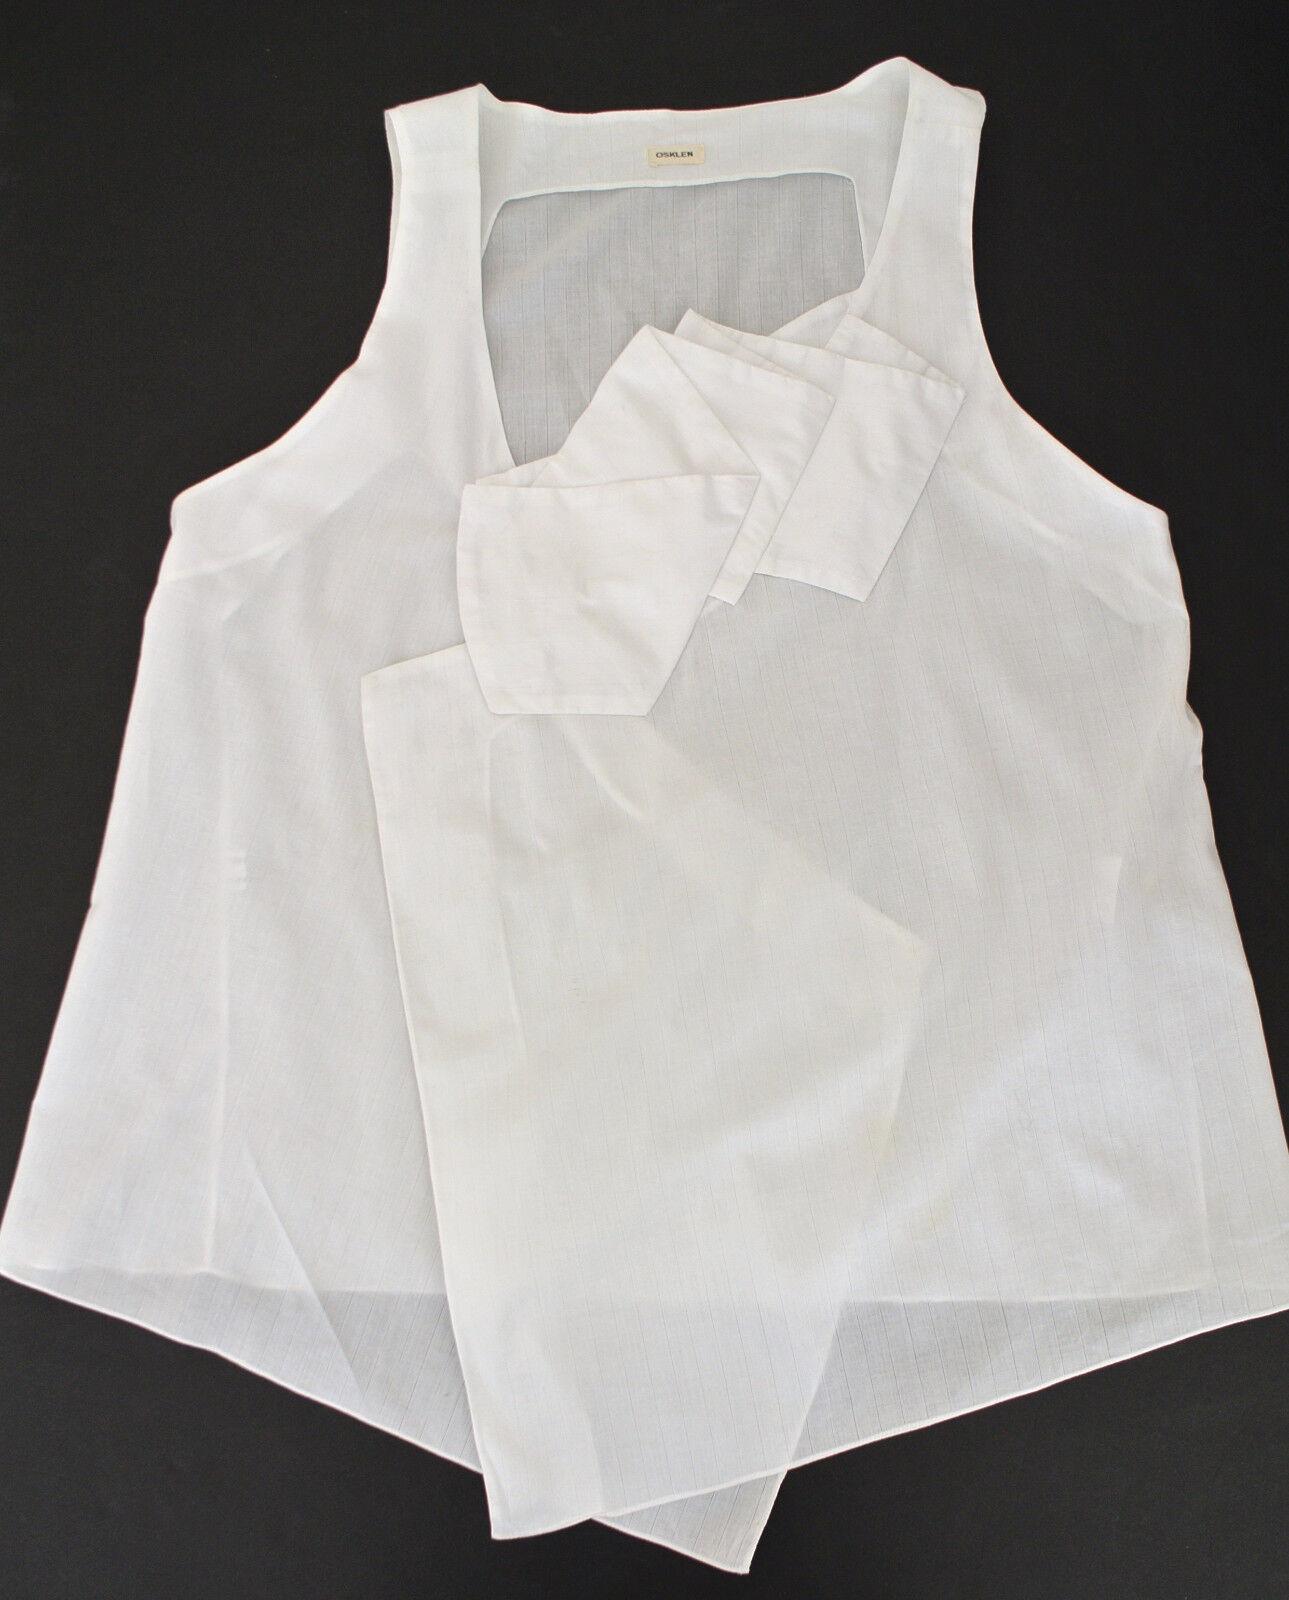 OSKLEN white pleated ruffle asymmetric top sz G L sleeveless